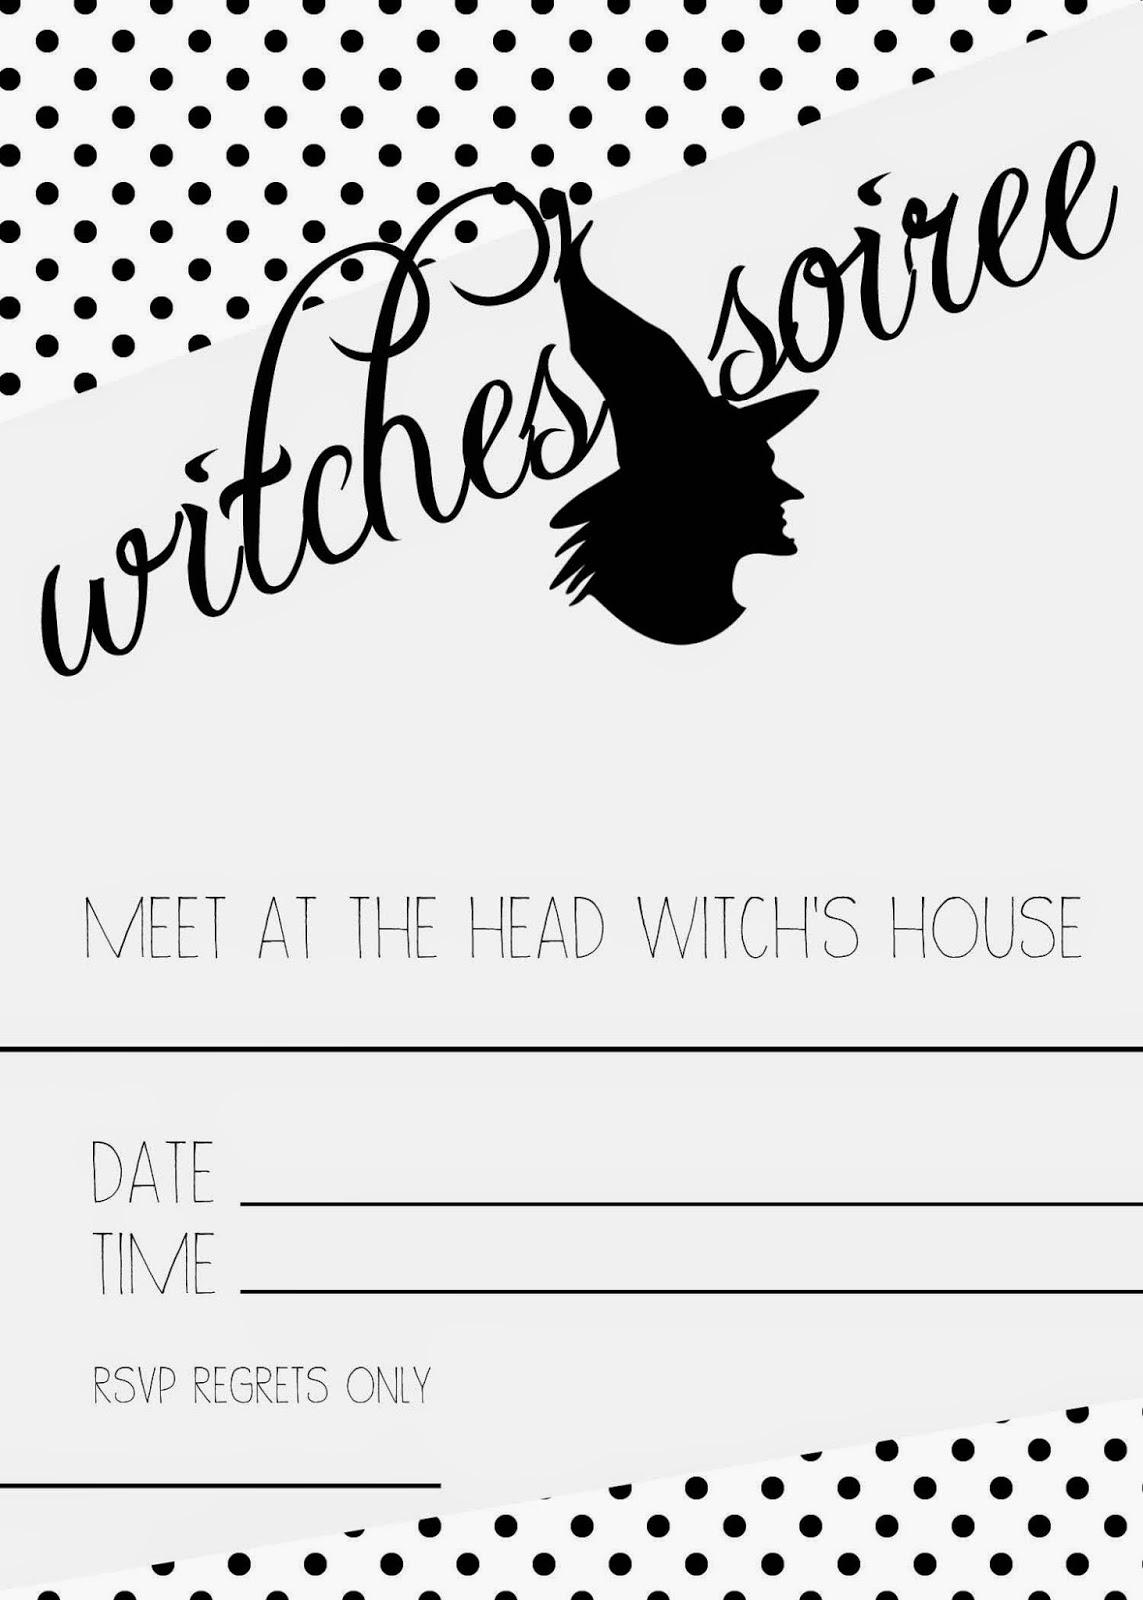 http://1.bp.blogspot.com/-cN81OS4B6sA/VCXR11JSz2I/AAAAAAAAtMg/MyWRKoo5ox8/s1600/witches%2Bsoiree.jpg